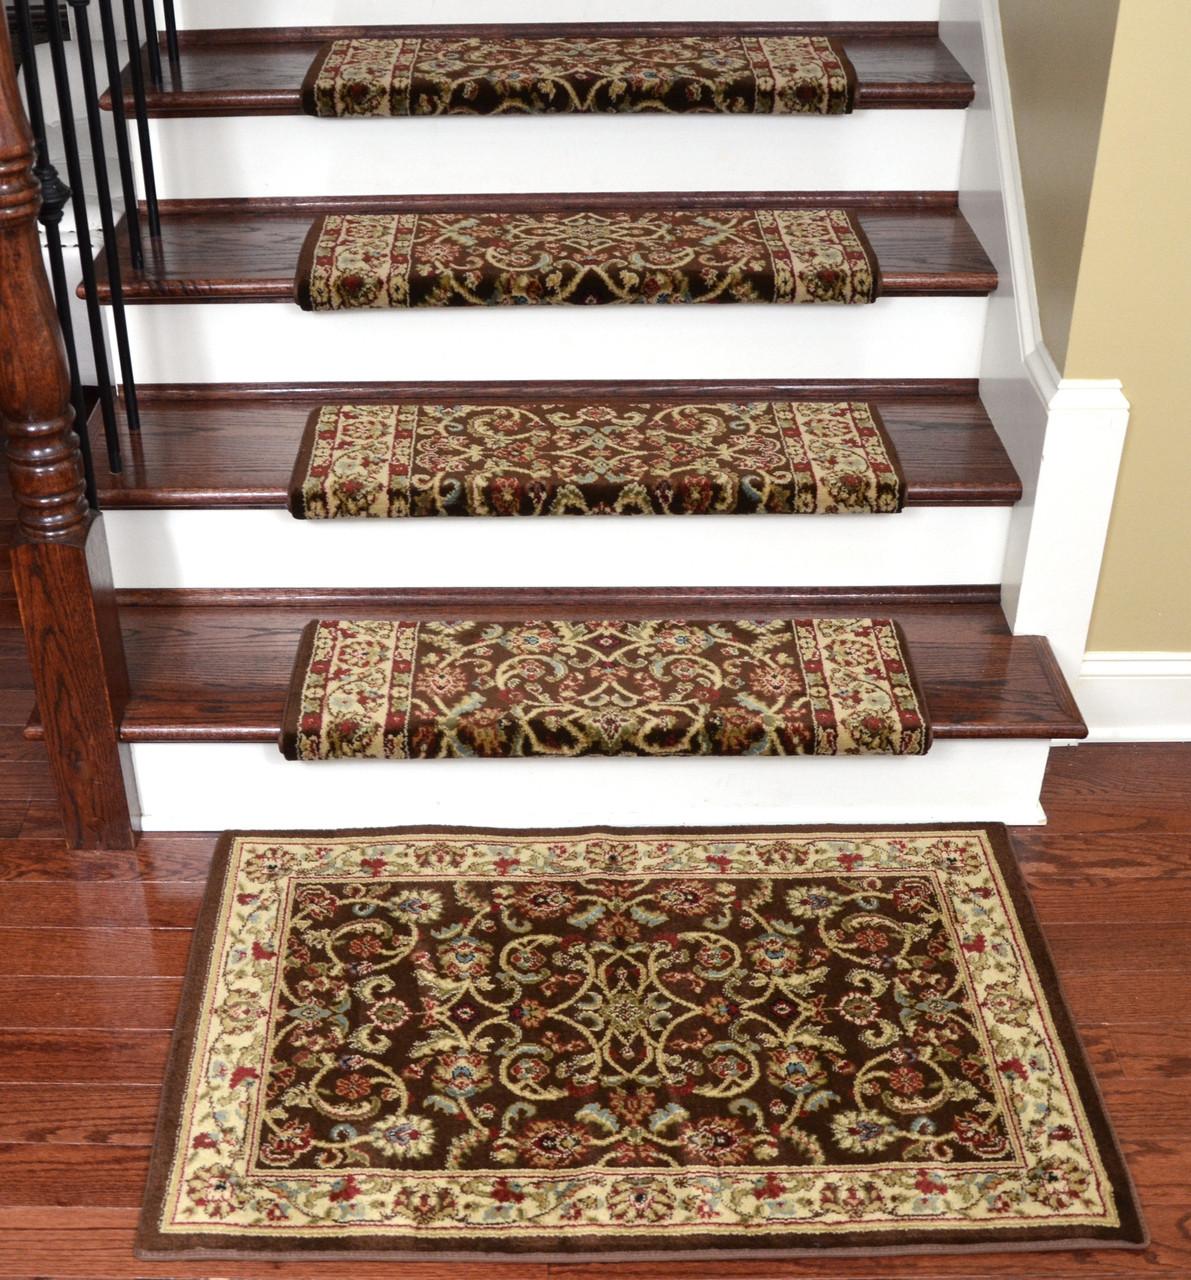 Image of: Dean Non Slip Tape Free Pet Friendly Stair Gripper Bullnose Carpet Stair Treads Classic Keshan Chocolate 31 W 15 Plus A Matching 27 X 39 Landing Mat 1 Dean Stair Treads